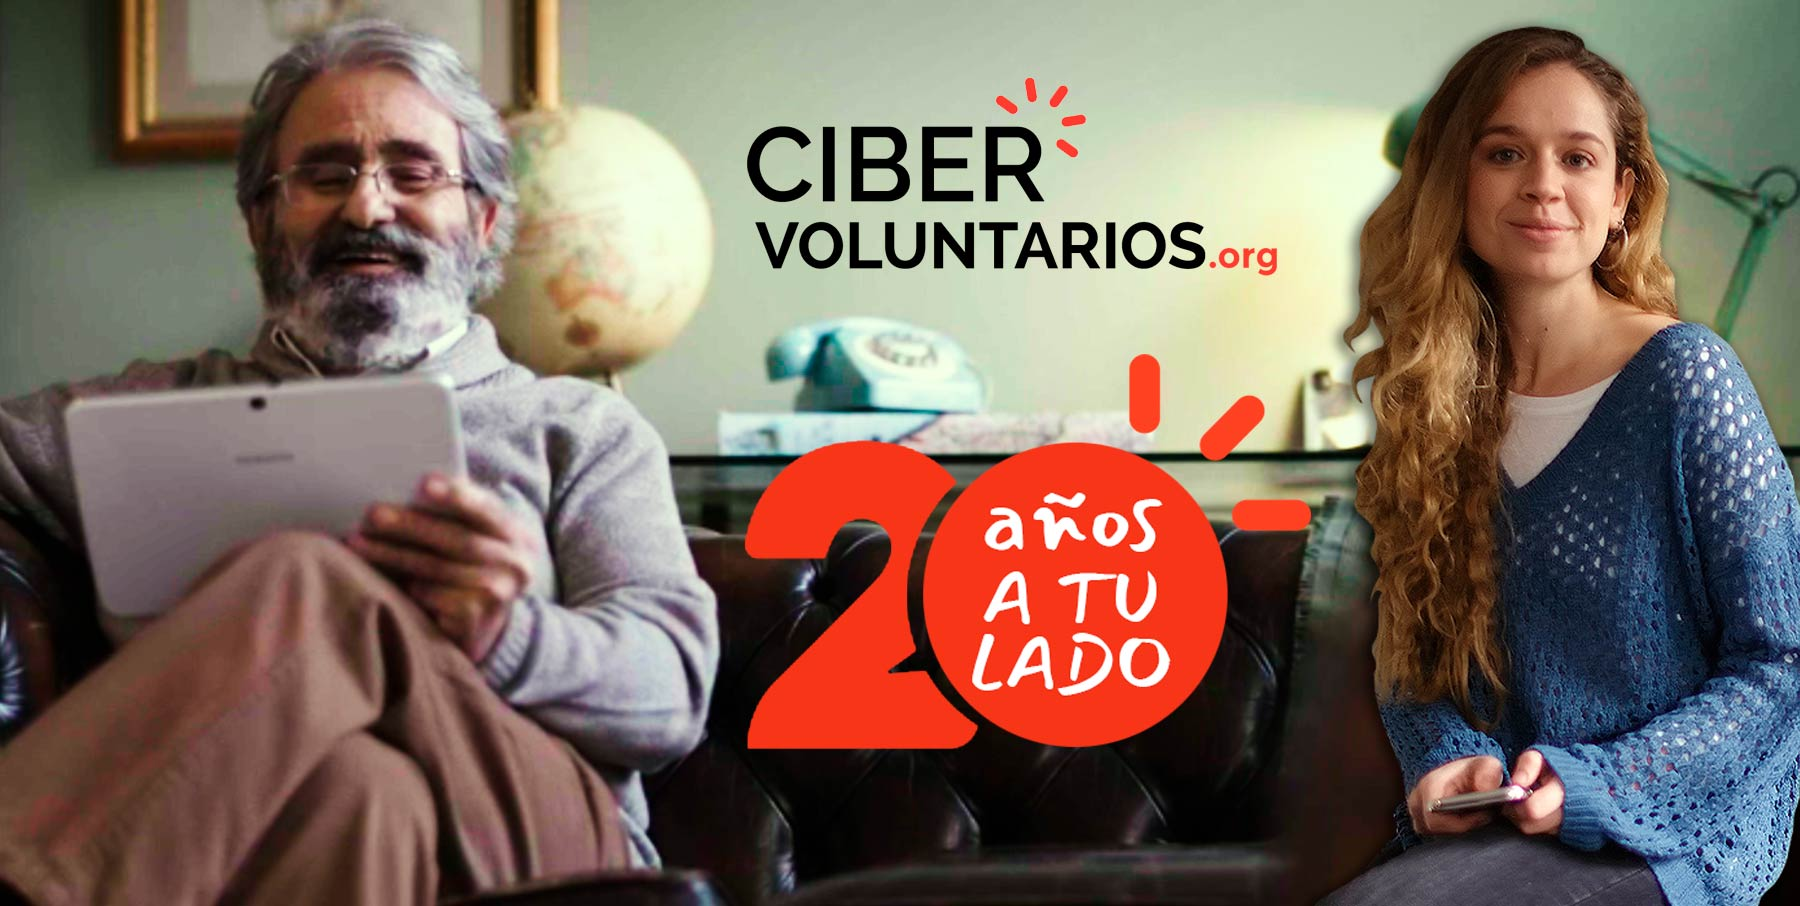 Cibervoluntarios turns 20 by your side